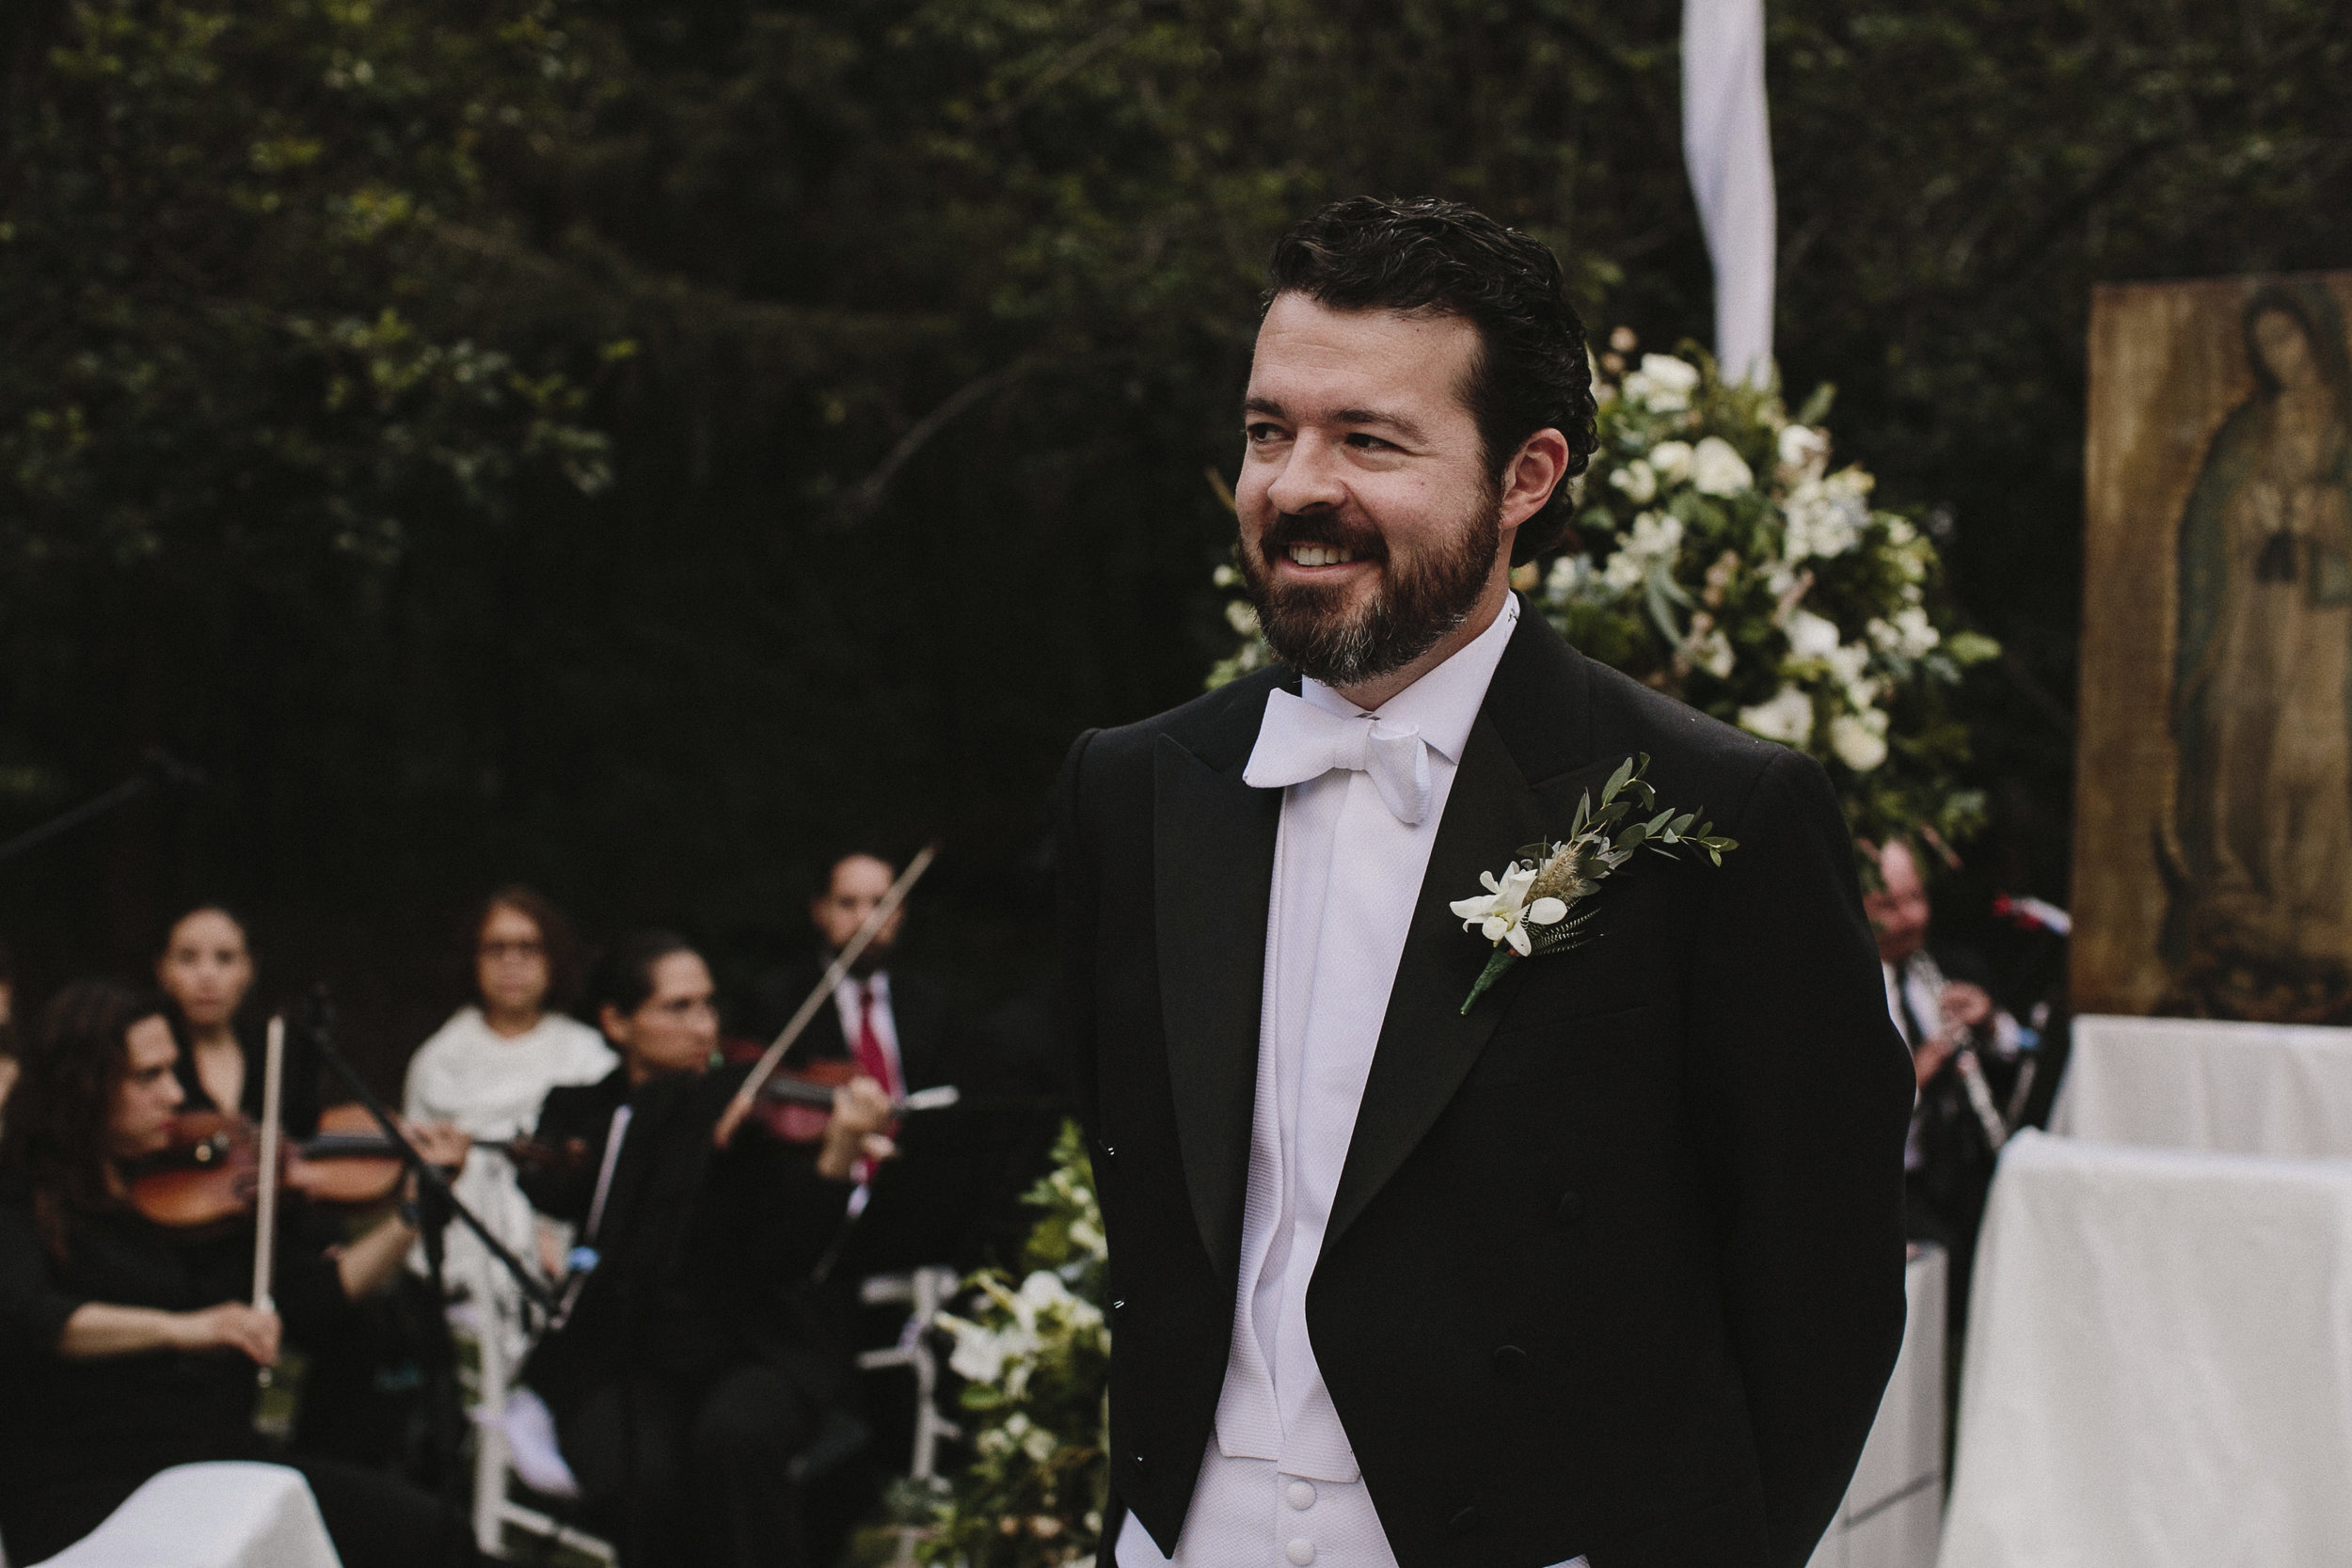 alfonso_flores_destination_wedding_photogrpahy_paola_alonso-384.JPG